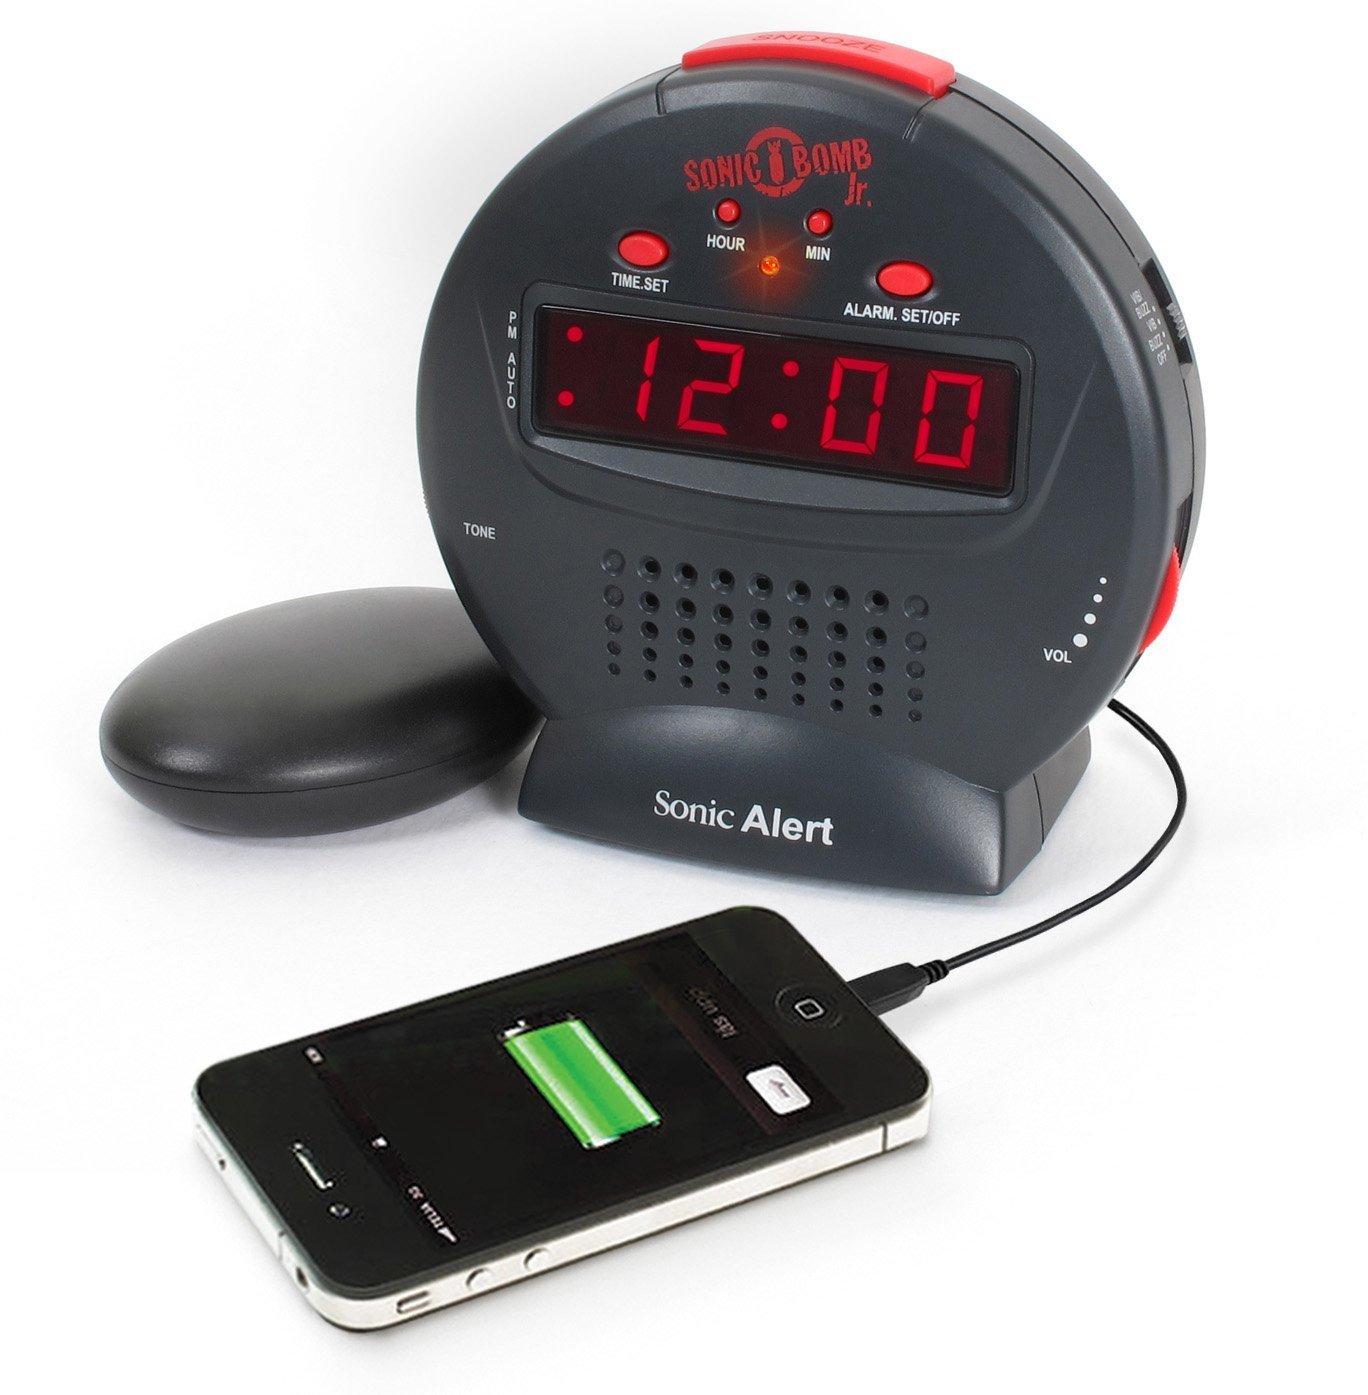 Alarm Clock For Kids, Sonic Bomb Jr Digital Loud Home Small Bedside Alarm Clock